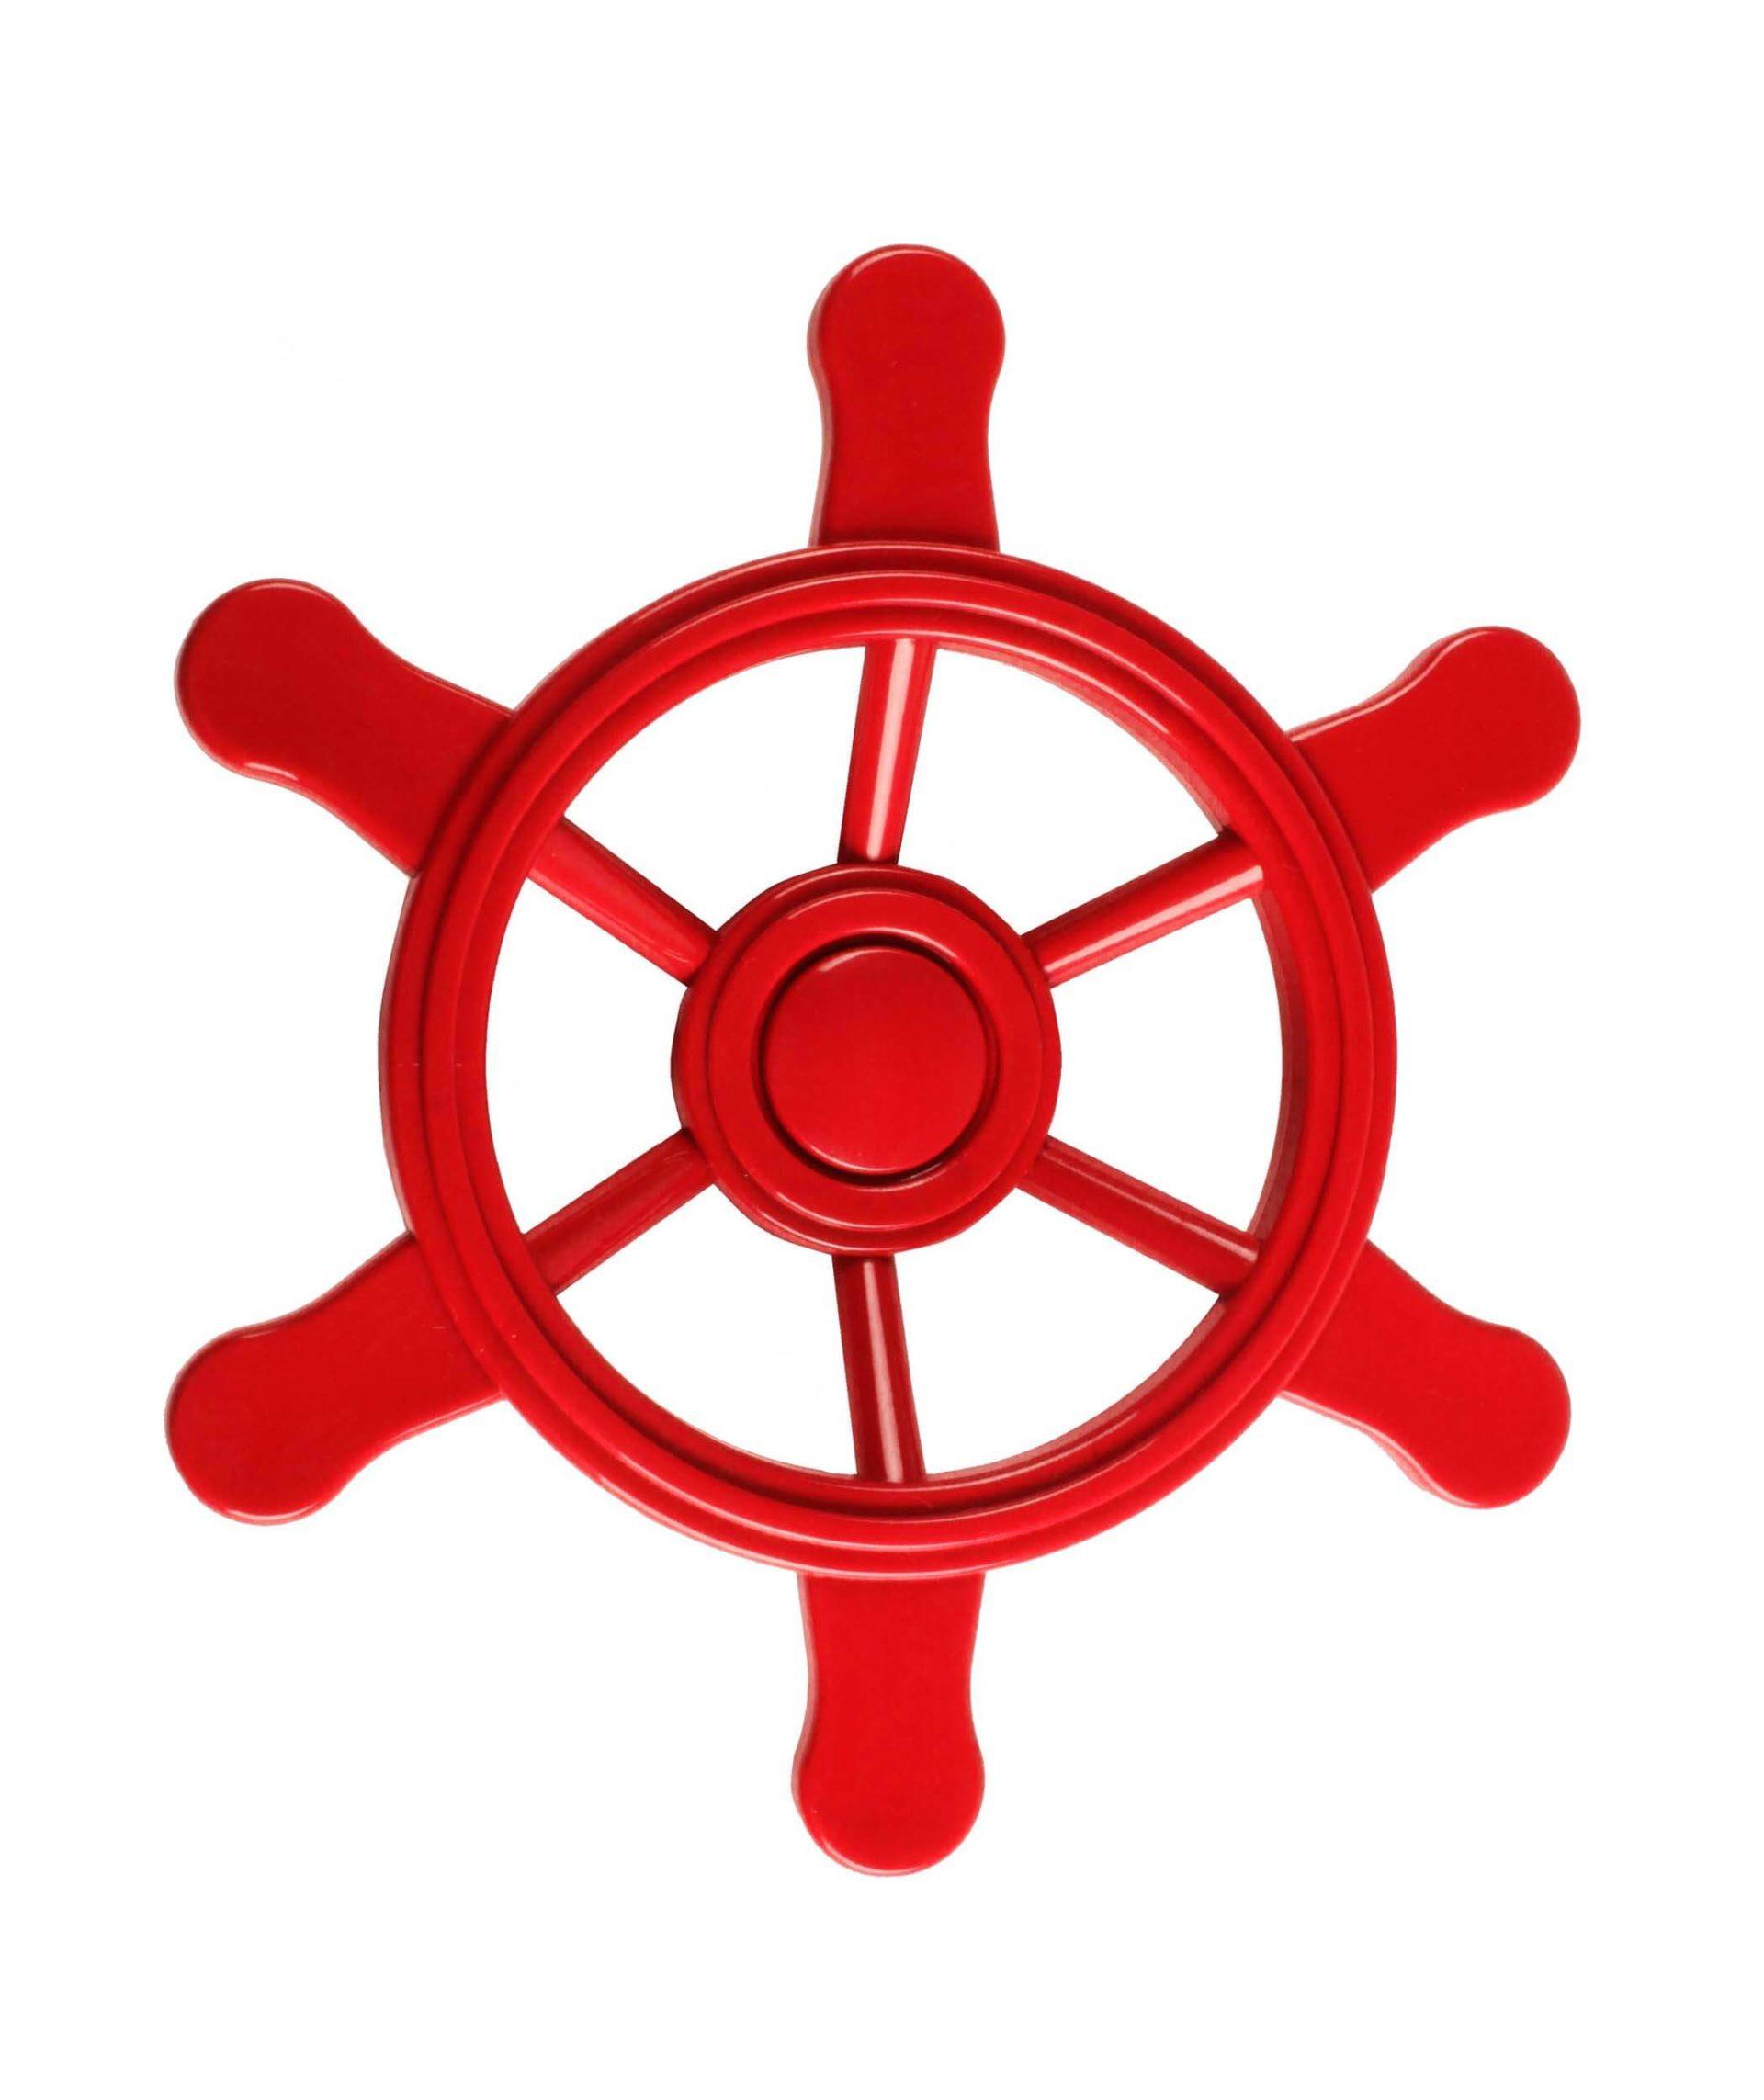 Pirate's wheel